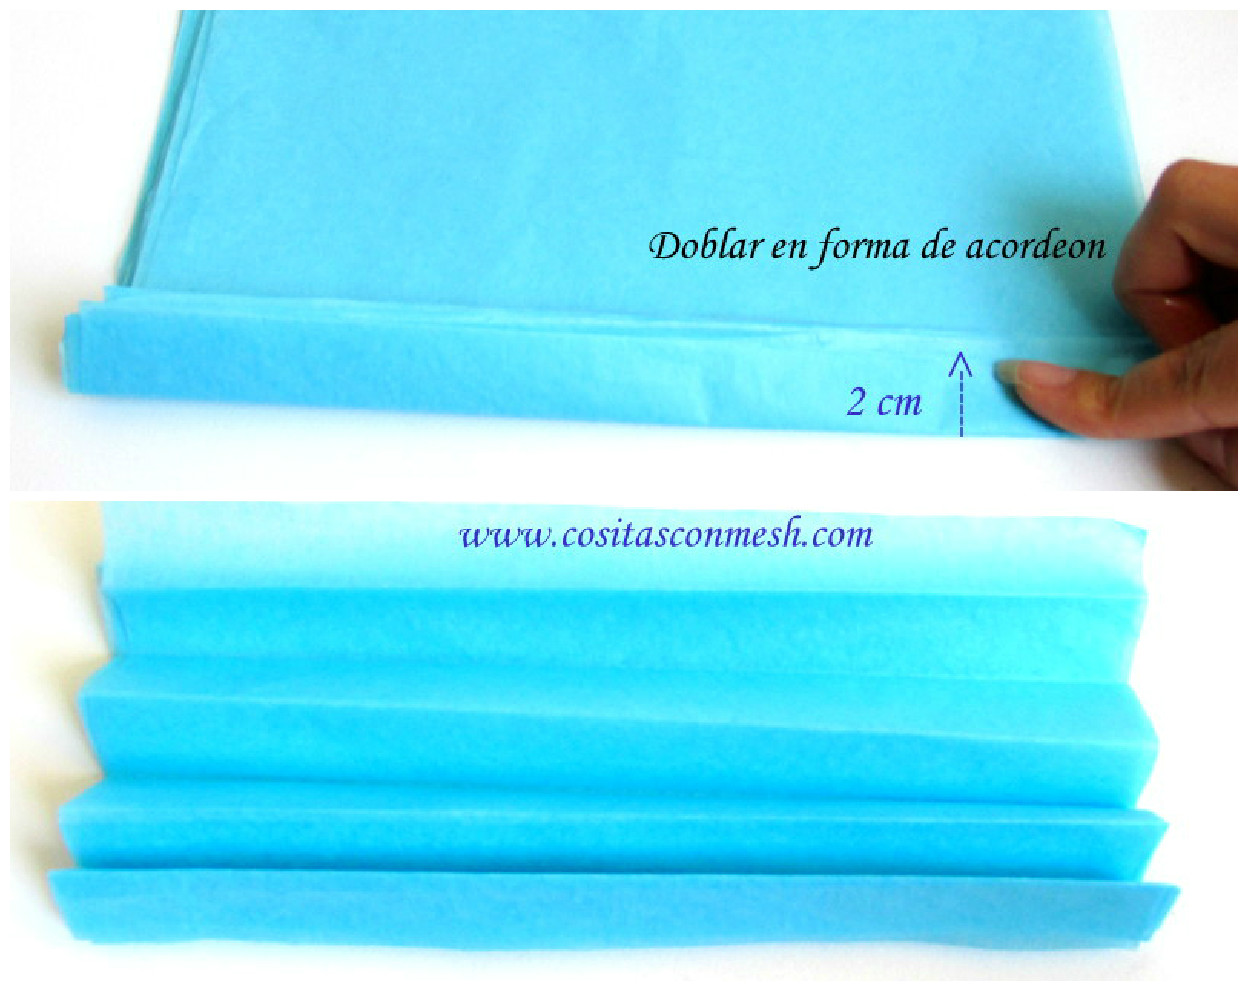 Decoracion con pompones de papel china tattoo design bild for Decoracion con papel